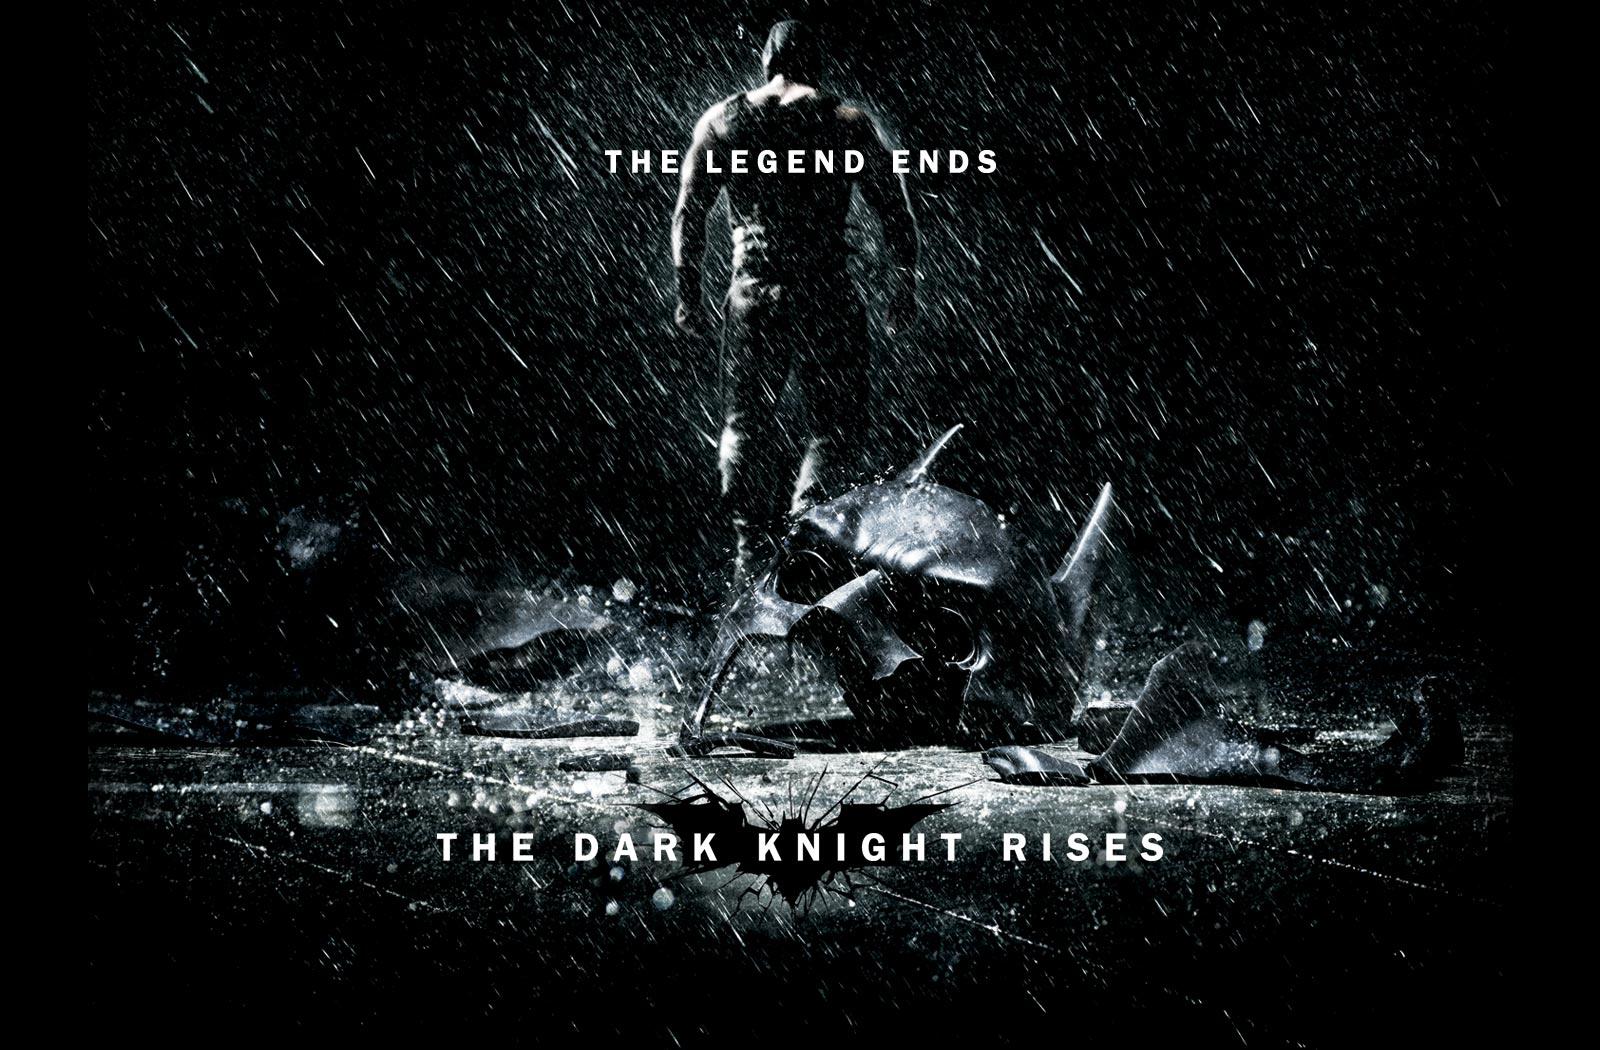 http://3.bp.blogspot.com/-oTjqXtMGIRU/T73FtxZd4yI/AAAAAAAAAZw/zt_AISuhK9I/s1600/dark++knight.jpg